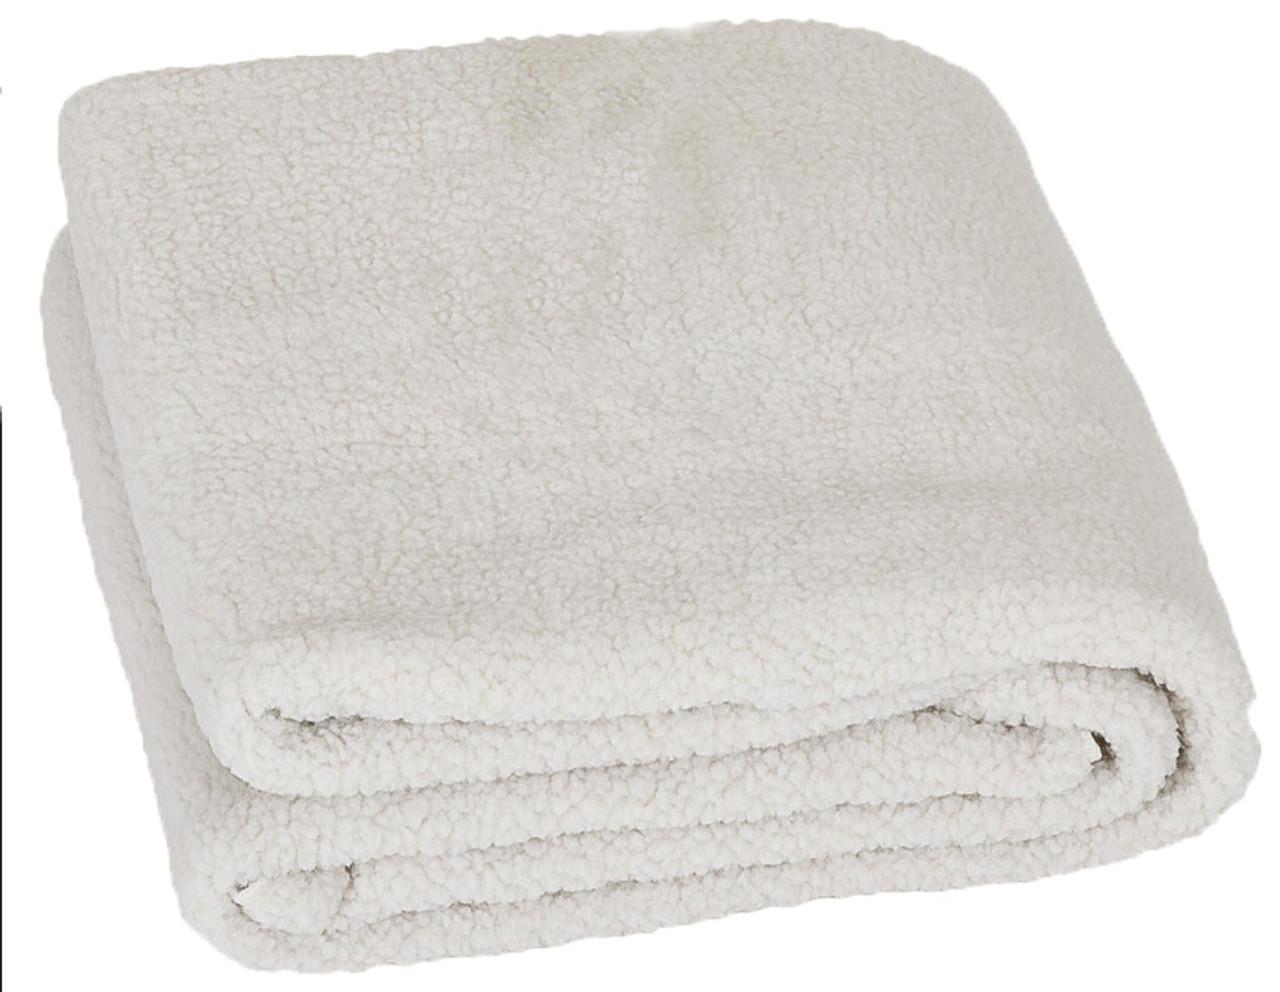 Fleece Massage Table Warmer - Standard Fit - Machine washable